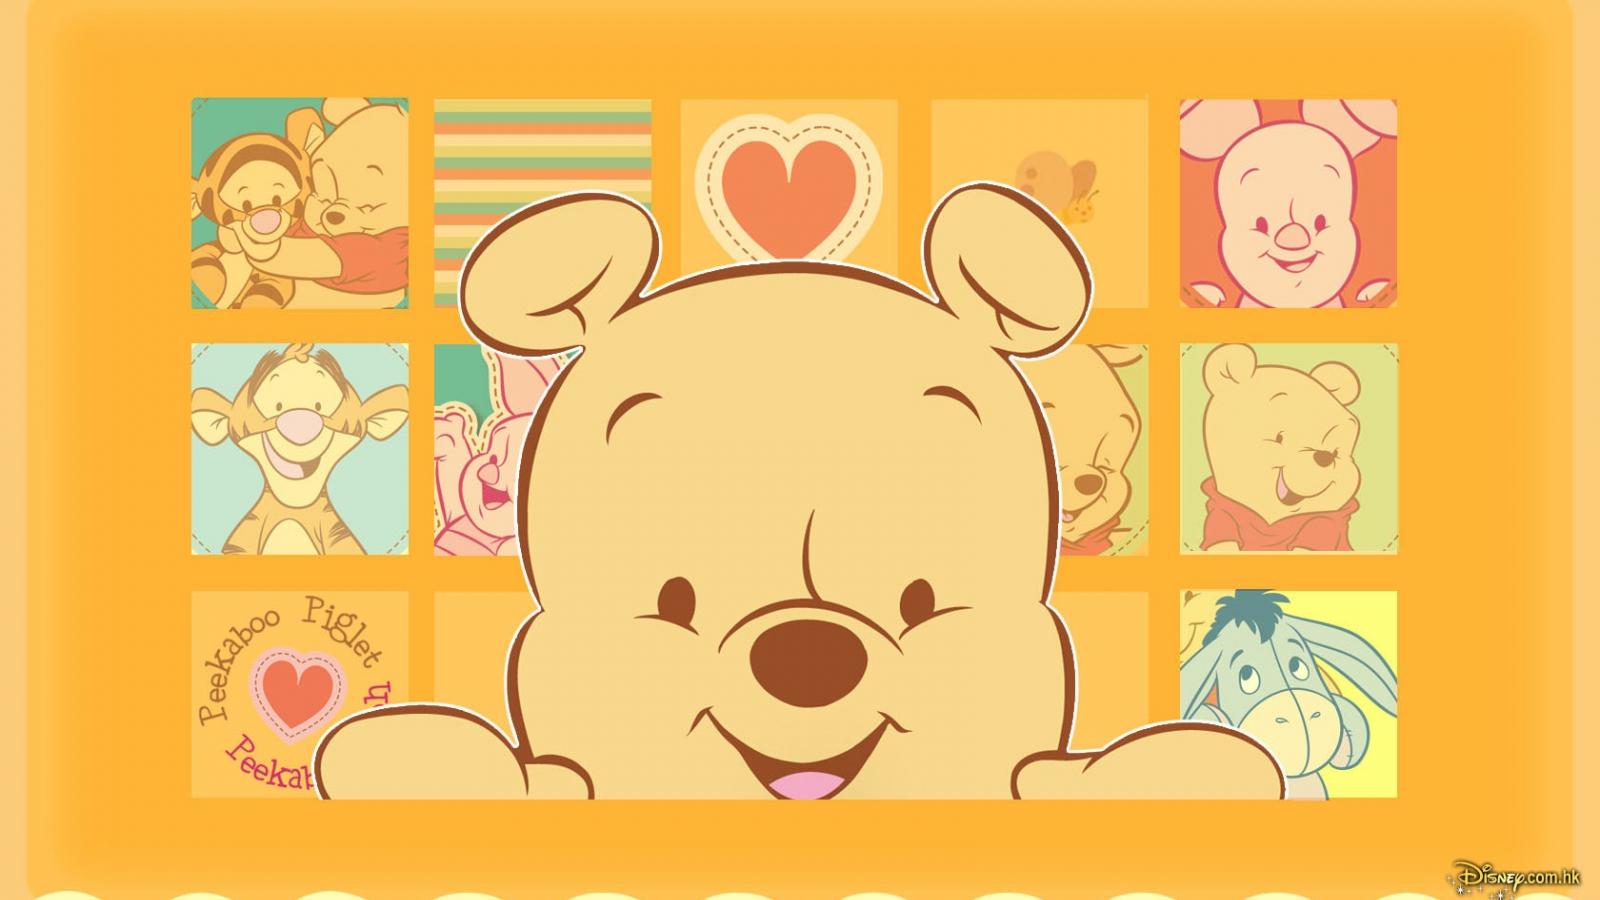 Free Download Baby Pooh Wallpaper 11004 Hd Wallpapers In Cartoons Imagescicom 1680x1050 For Your Desktop Mobile Tablet Explore 76 Pooh Bear Desktop Wallpaper Pooh Bear Wallpaper Winnie The Pooh